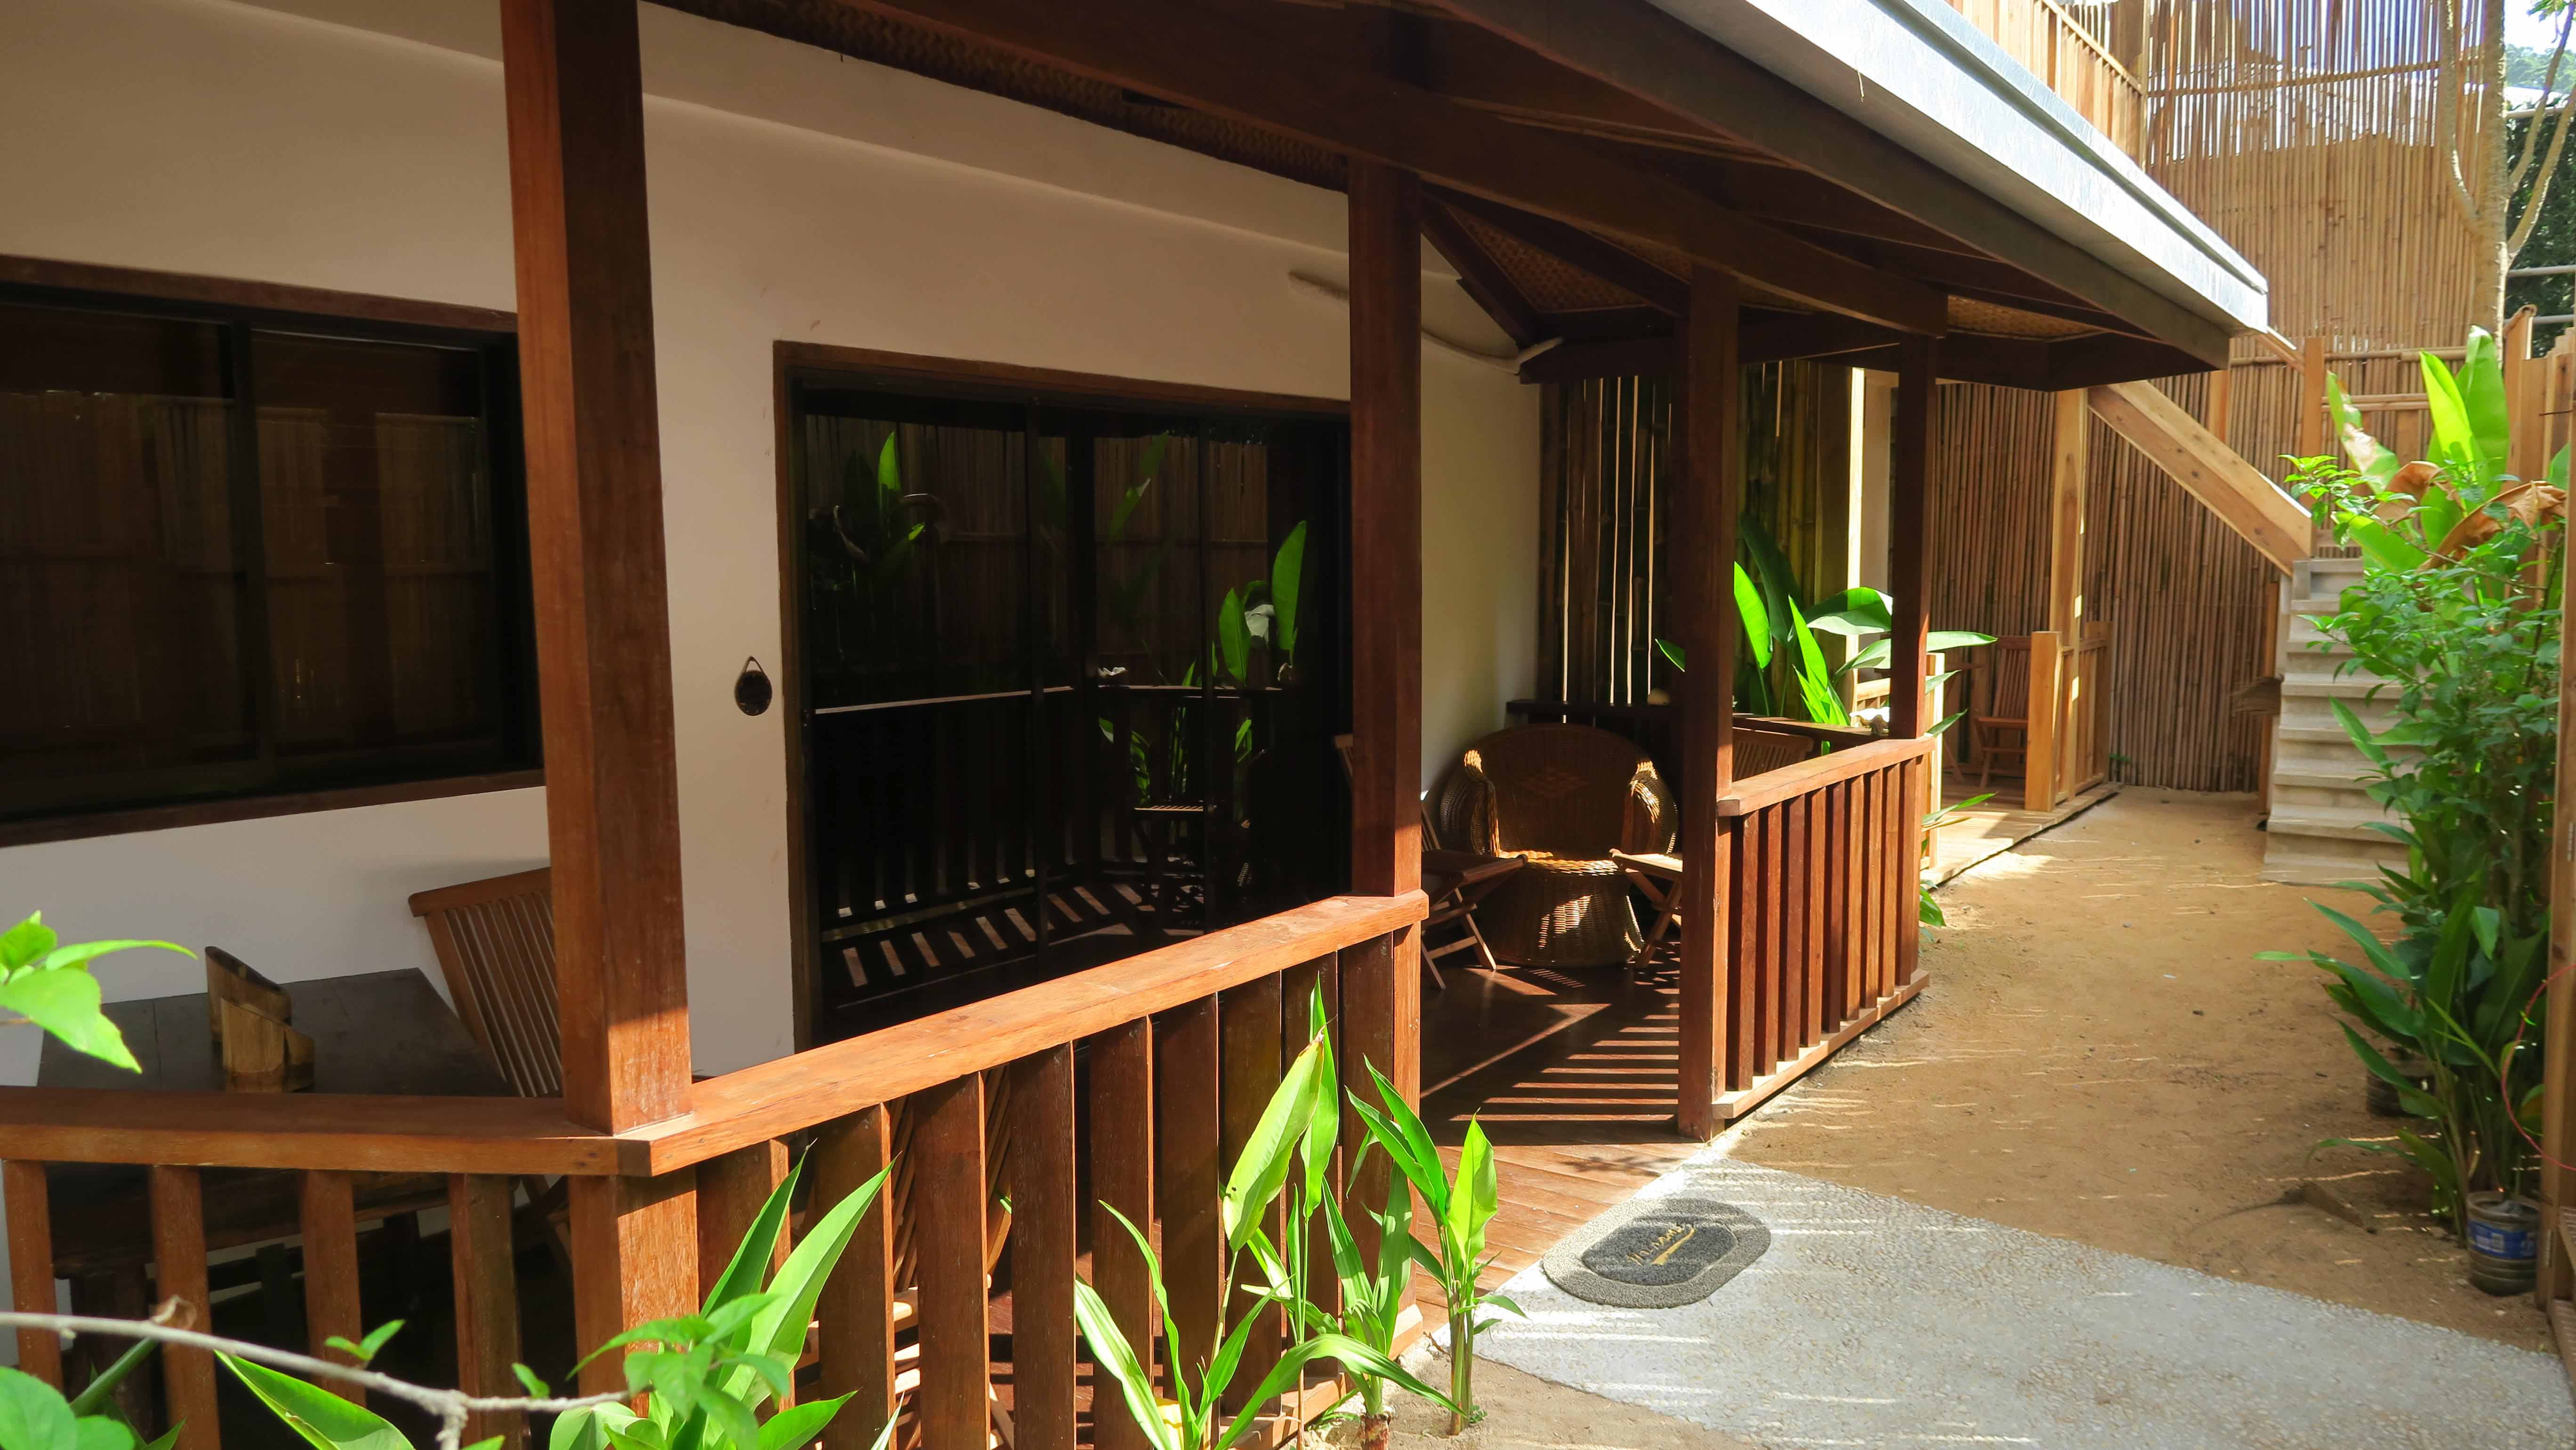 Hotel Accomodation Best Hotel Travel Adventure Traveller's Hotel El Nido Palawan Philippines Explore Philippines